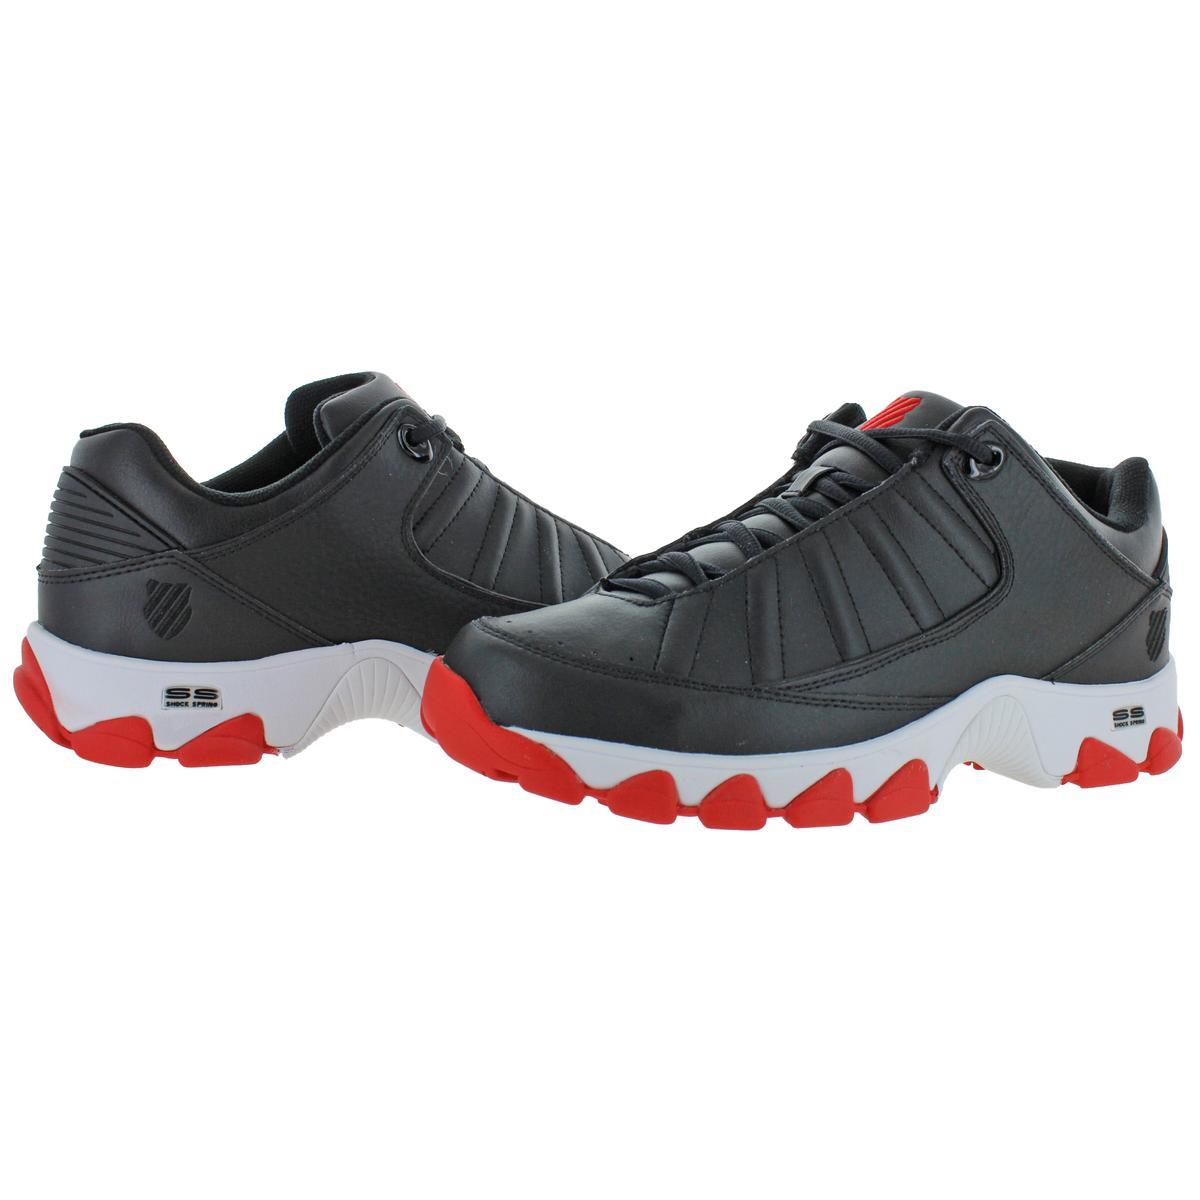 K-Swiss-Men-039-s-ST529-Heritage-Leather-Fashion-Sneakers-Shoes miniatuur 3